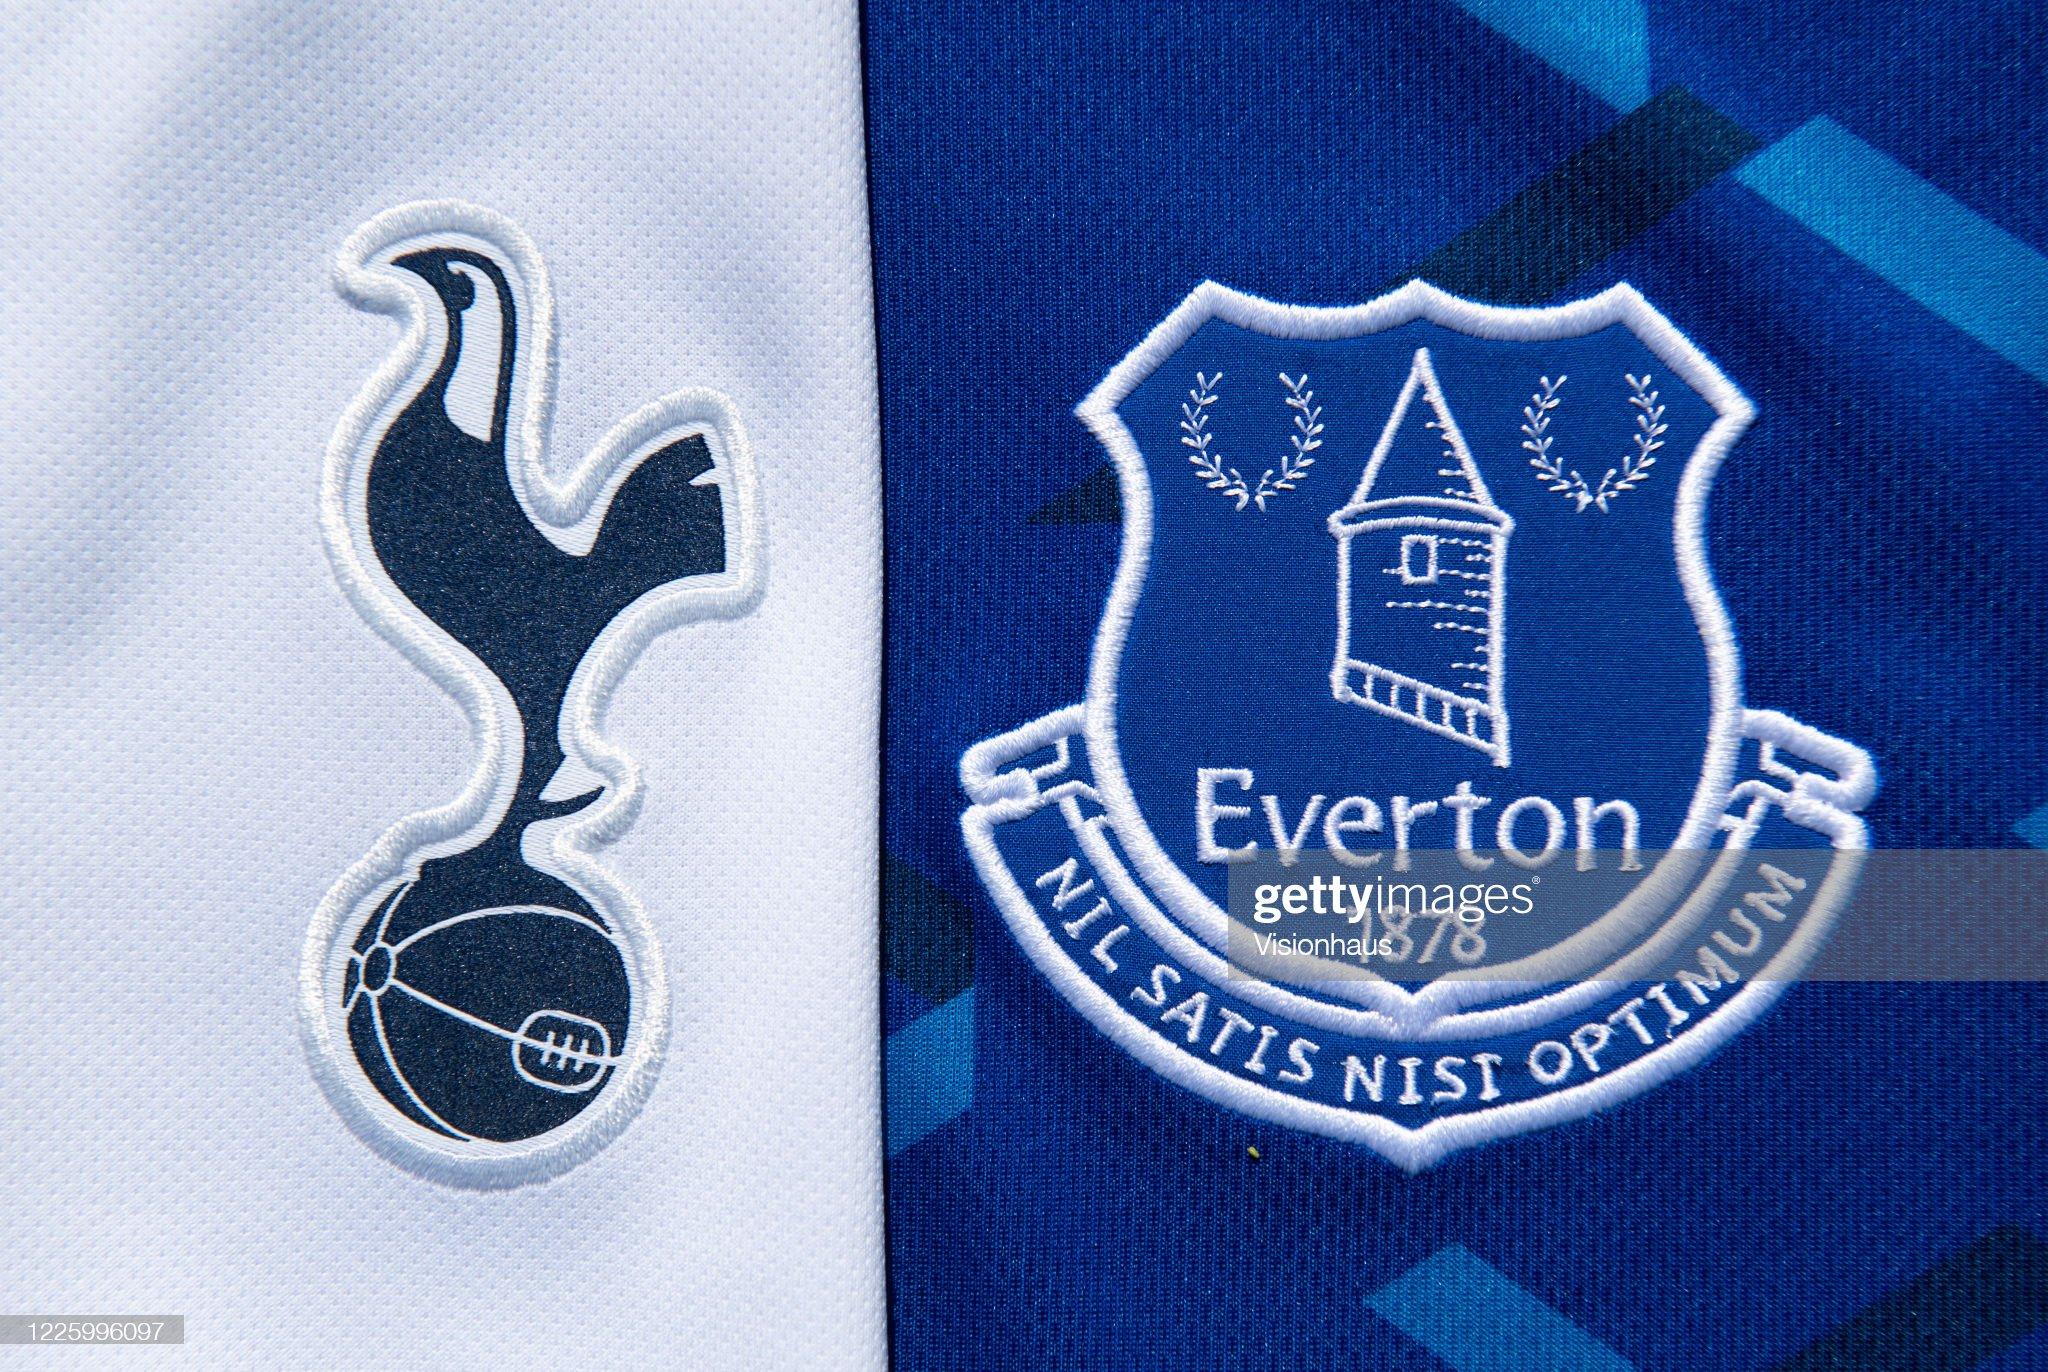 Tottenham vs Everton Preview, prediction and odds